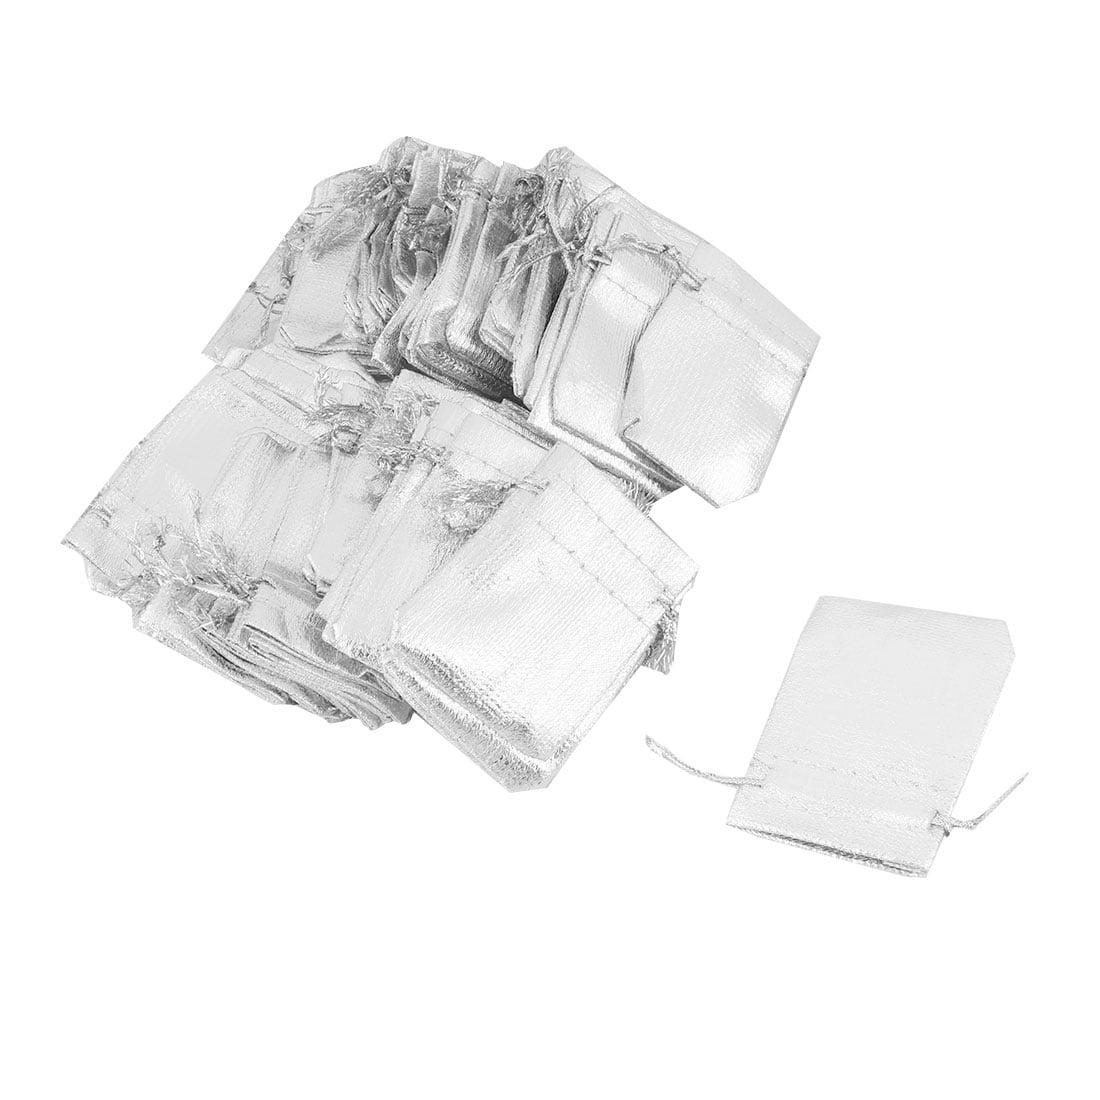 Lady Plastic Gift Jewelry Ring Holder Drawstring Bag Silver Tone 7cm x 5cm 50pcs - image 4 of 4